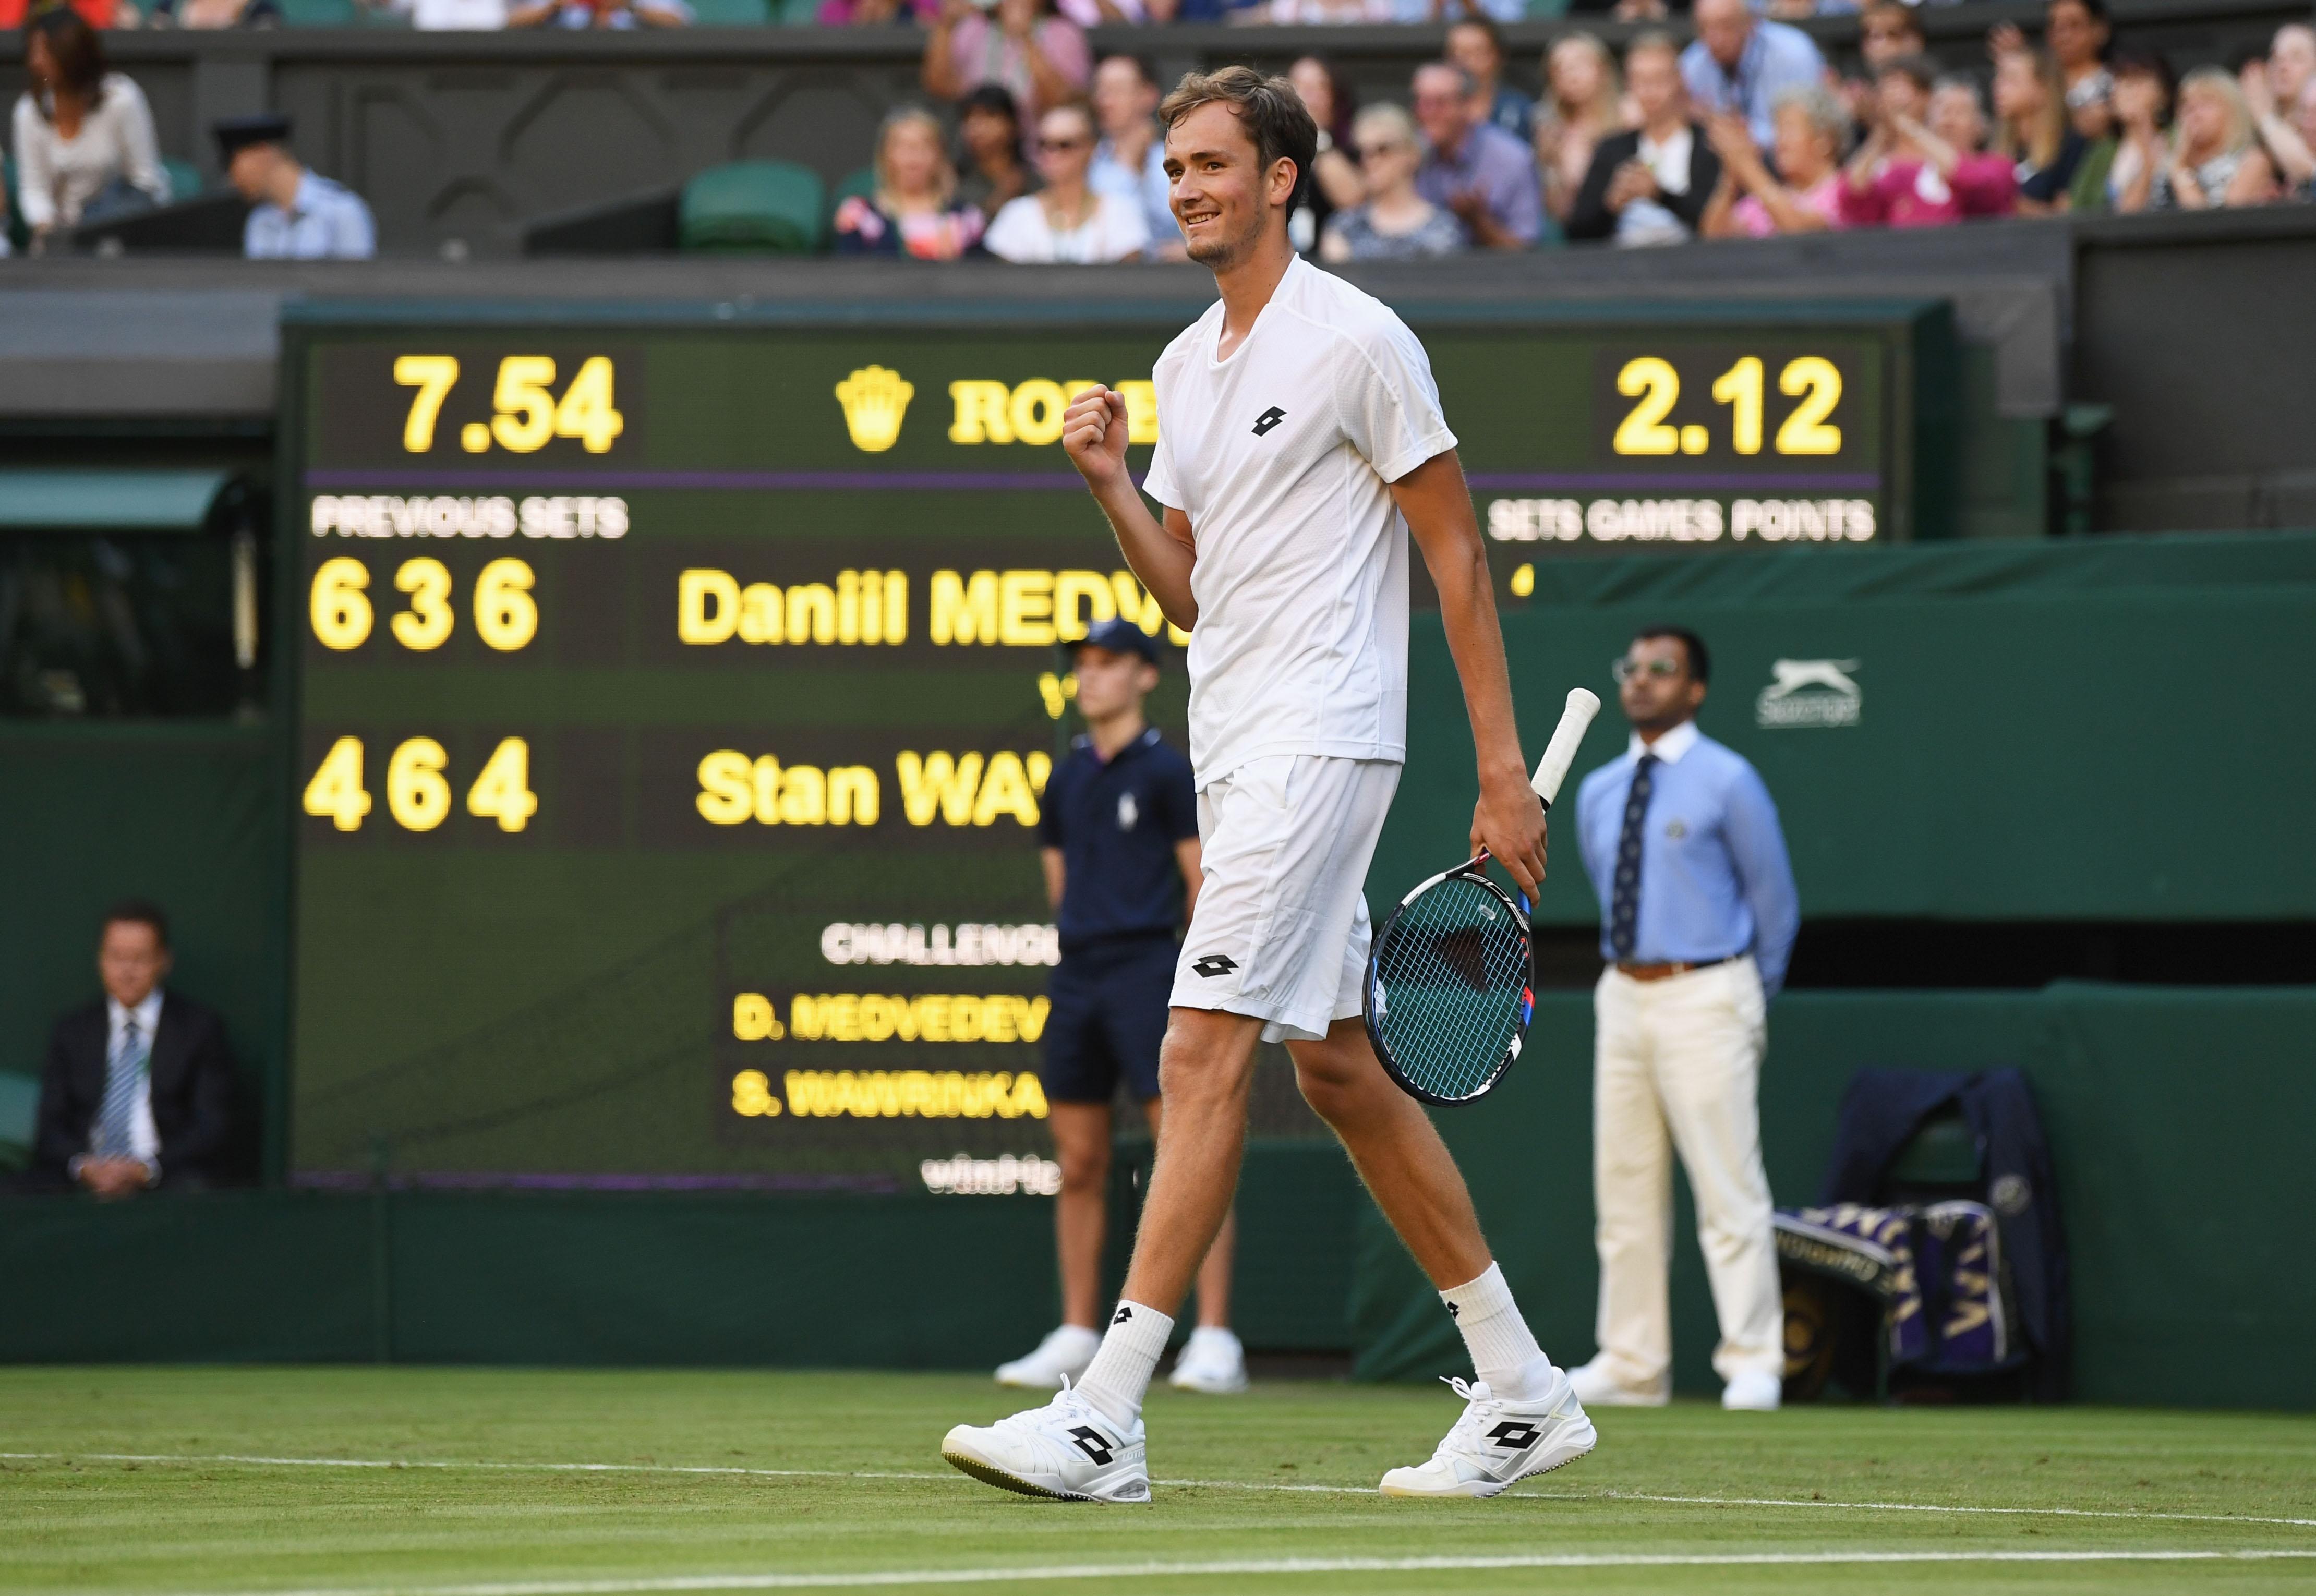 Danil Medvedev gelang die Überraschung des Tages. Der Russe kegelte Stan Wawrinka aus dem Turnier.